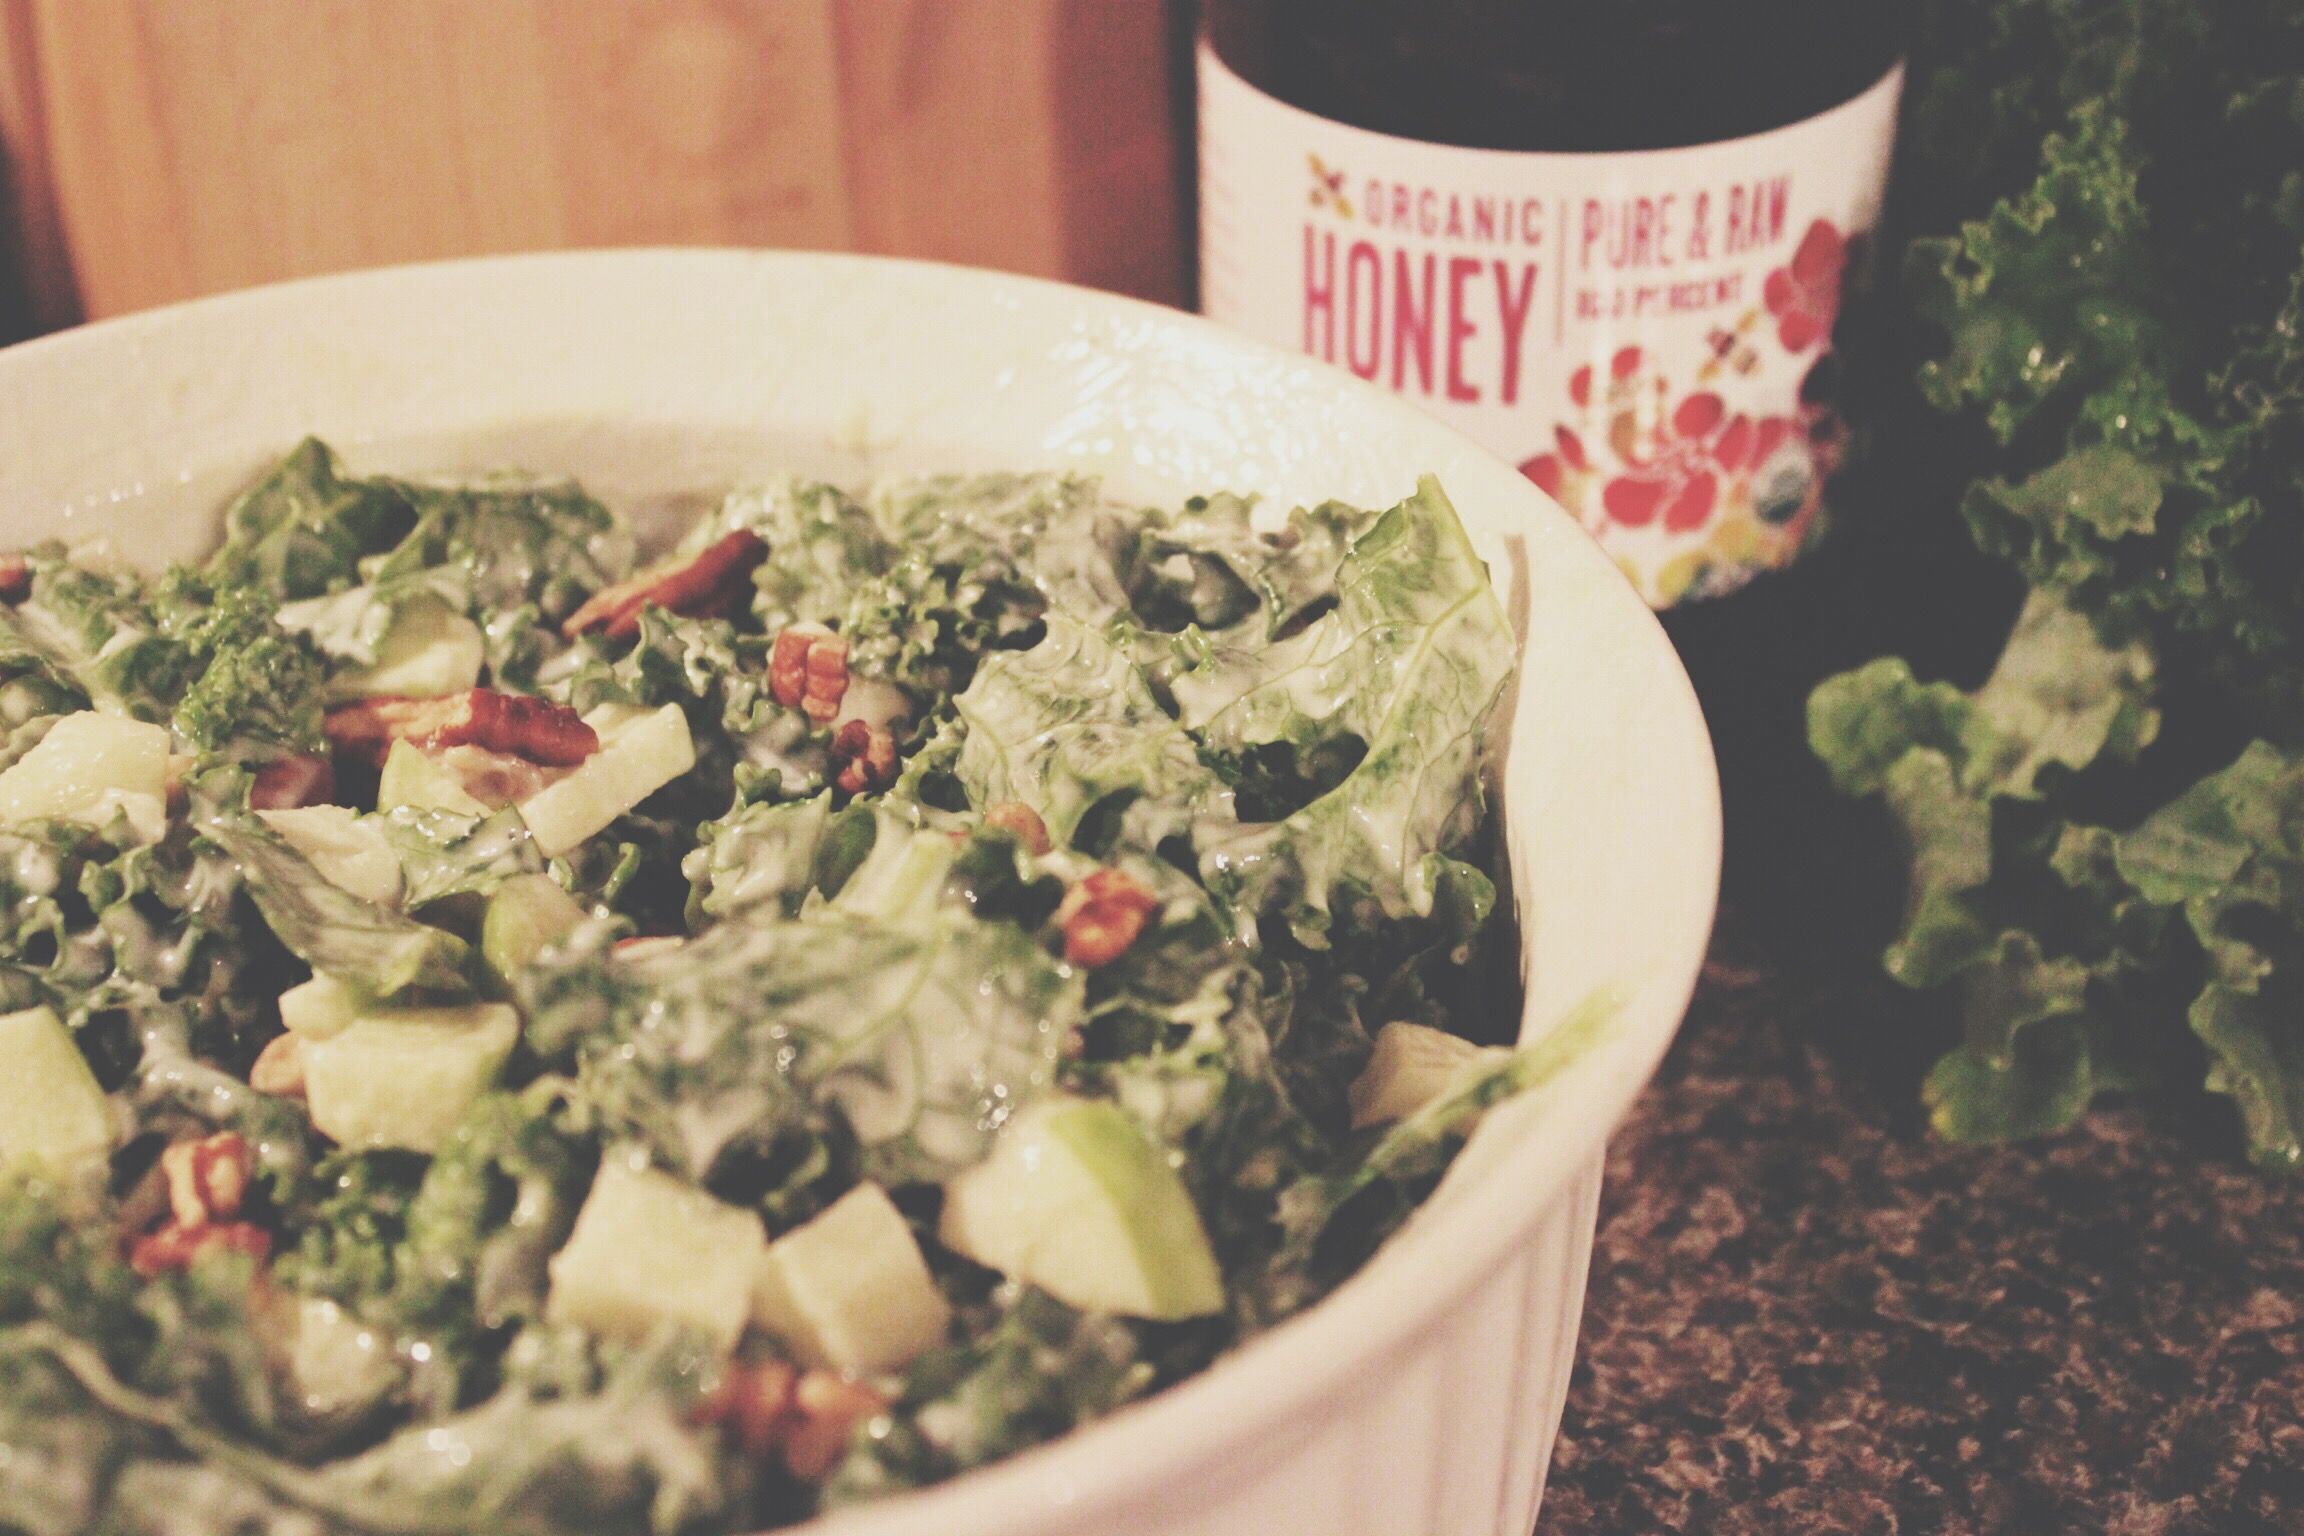 Kale & Apple Pecan Slaw/Salad